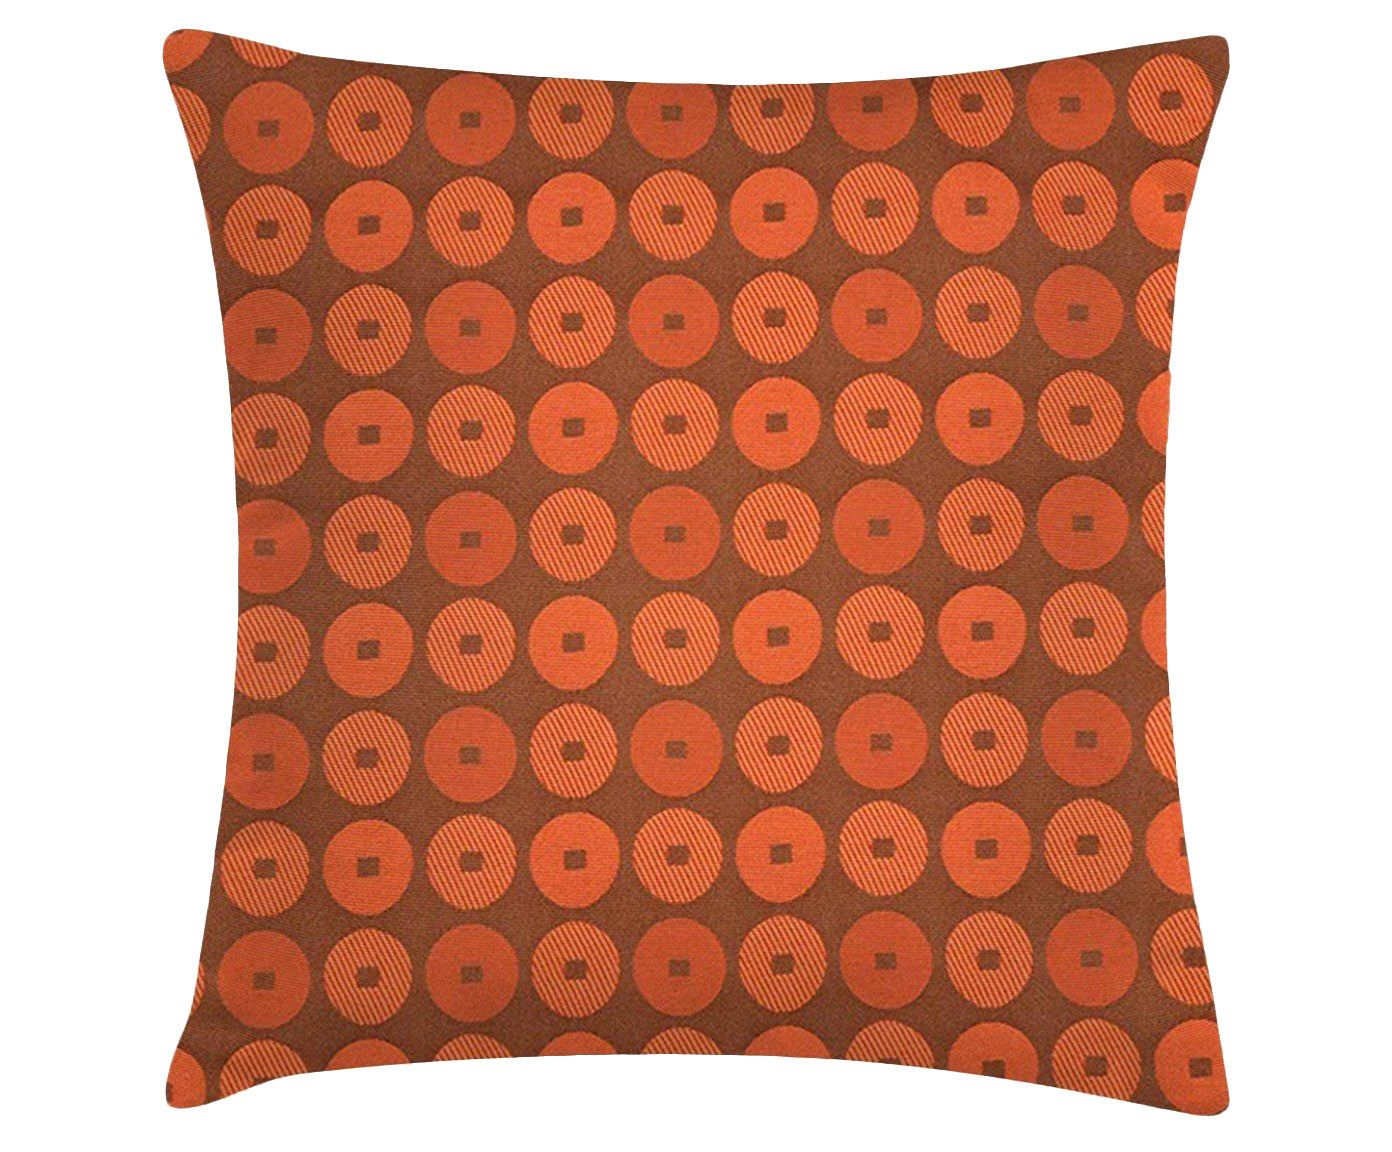 Capa para almofada palmas circles ritz - 45x45cm | Westwing.com.br